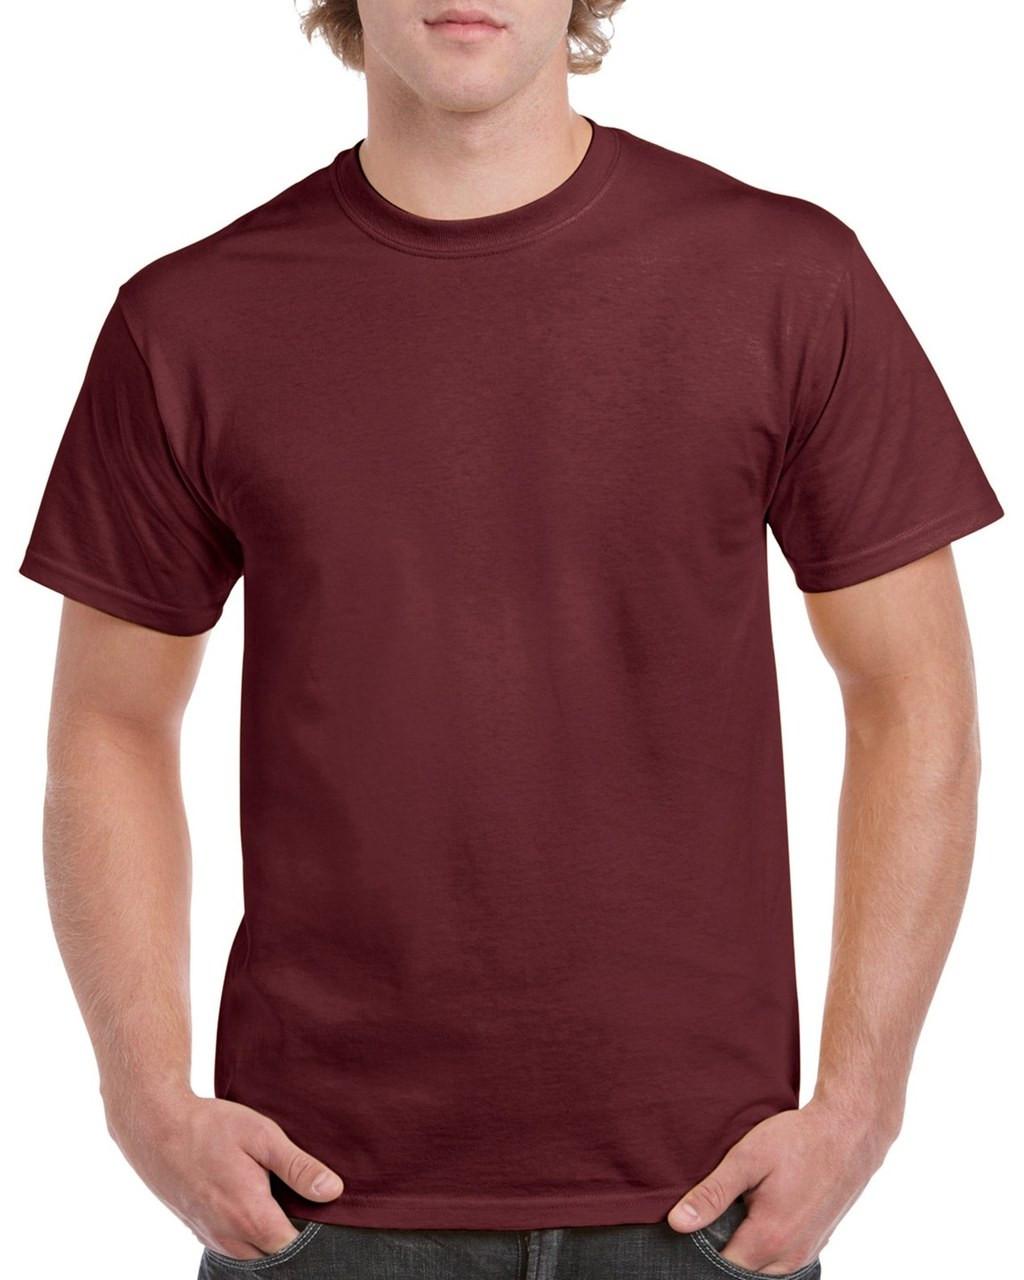 d224d9110dcb5 5000 - Gildan Heavy Cotton Adult T-Shirt